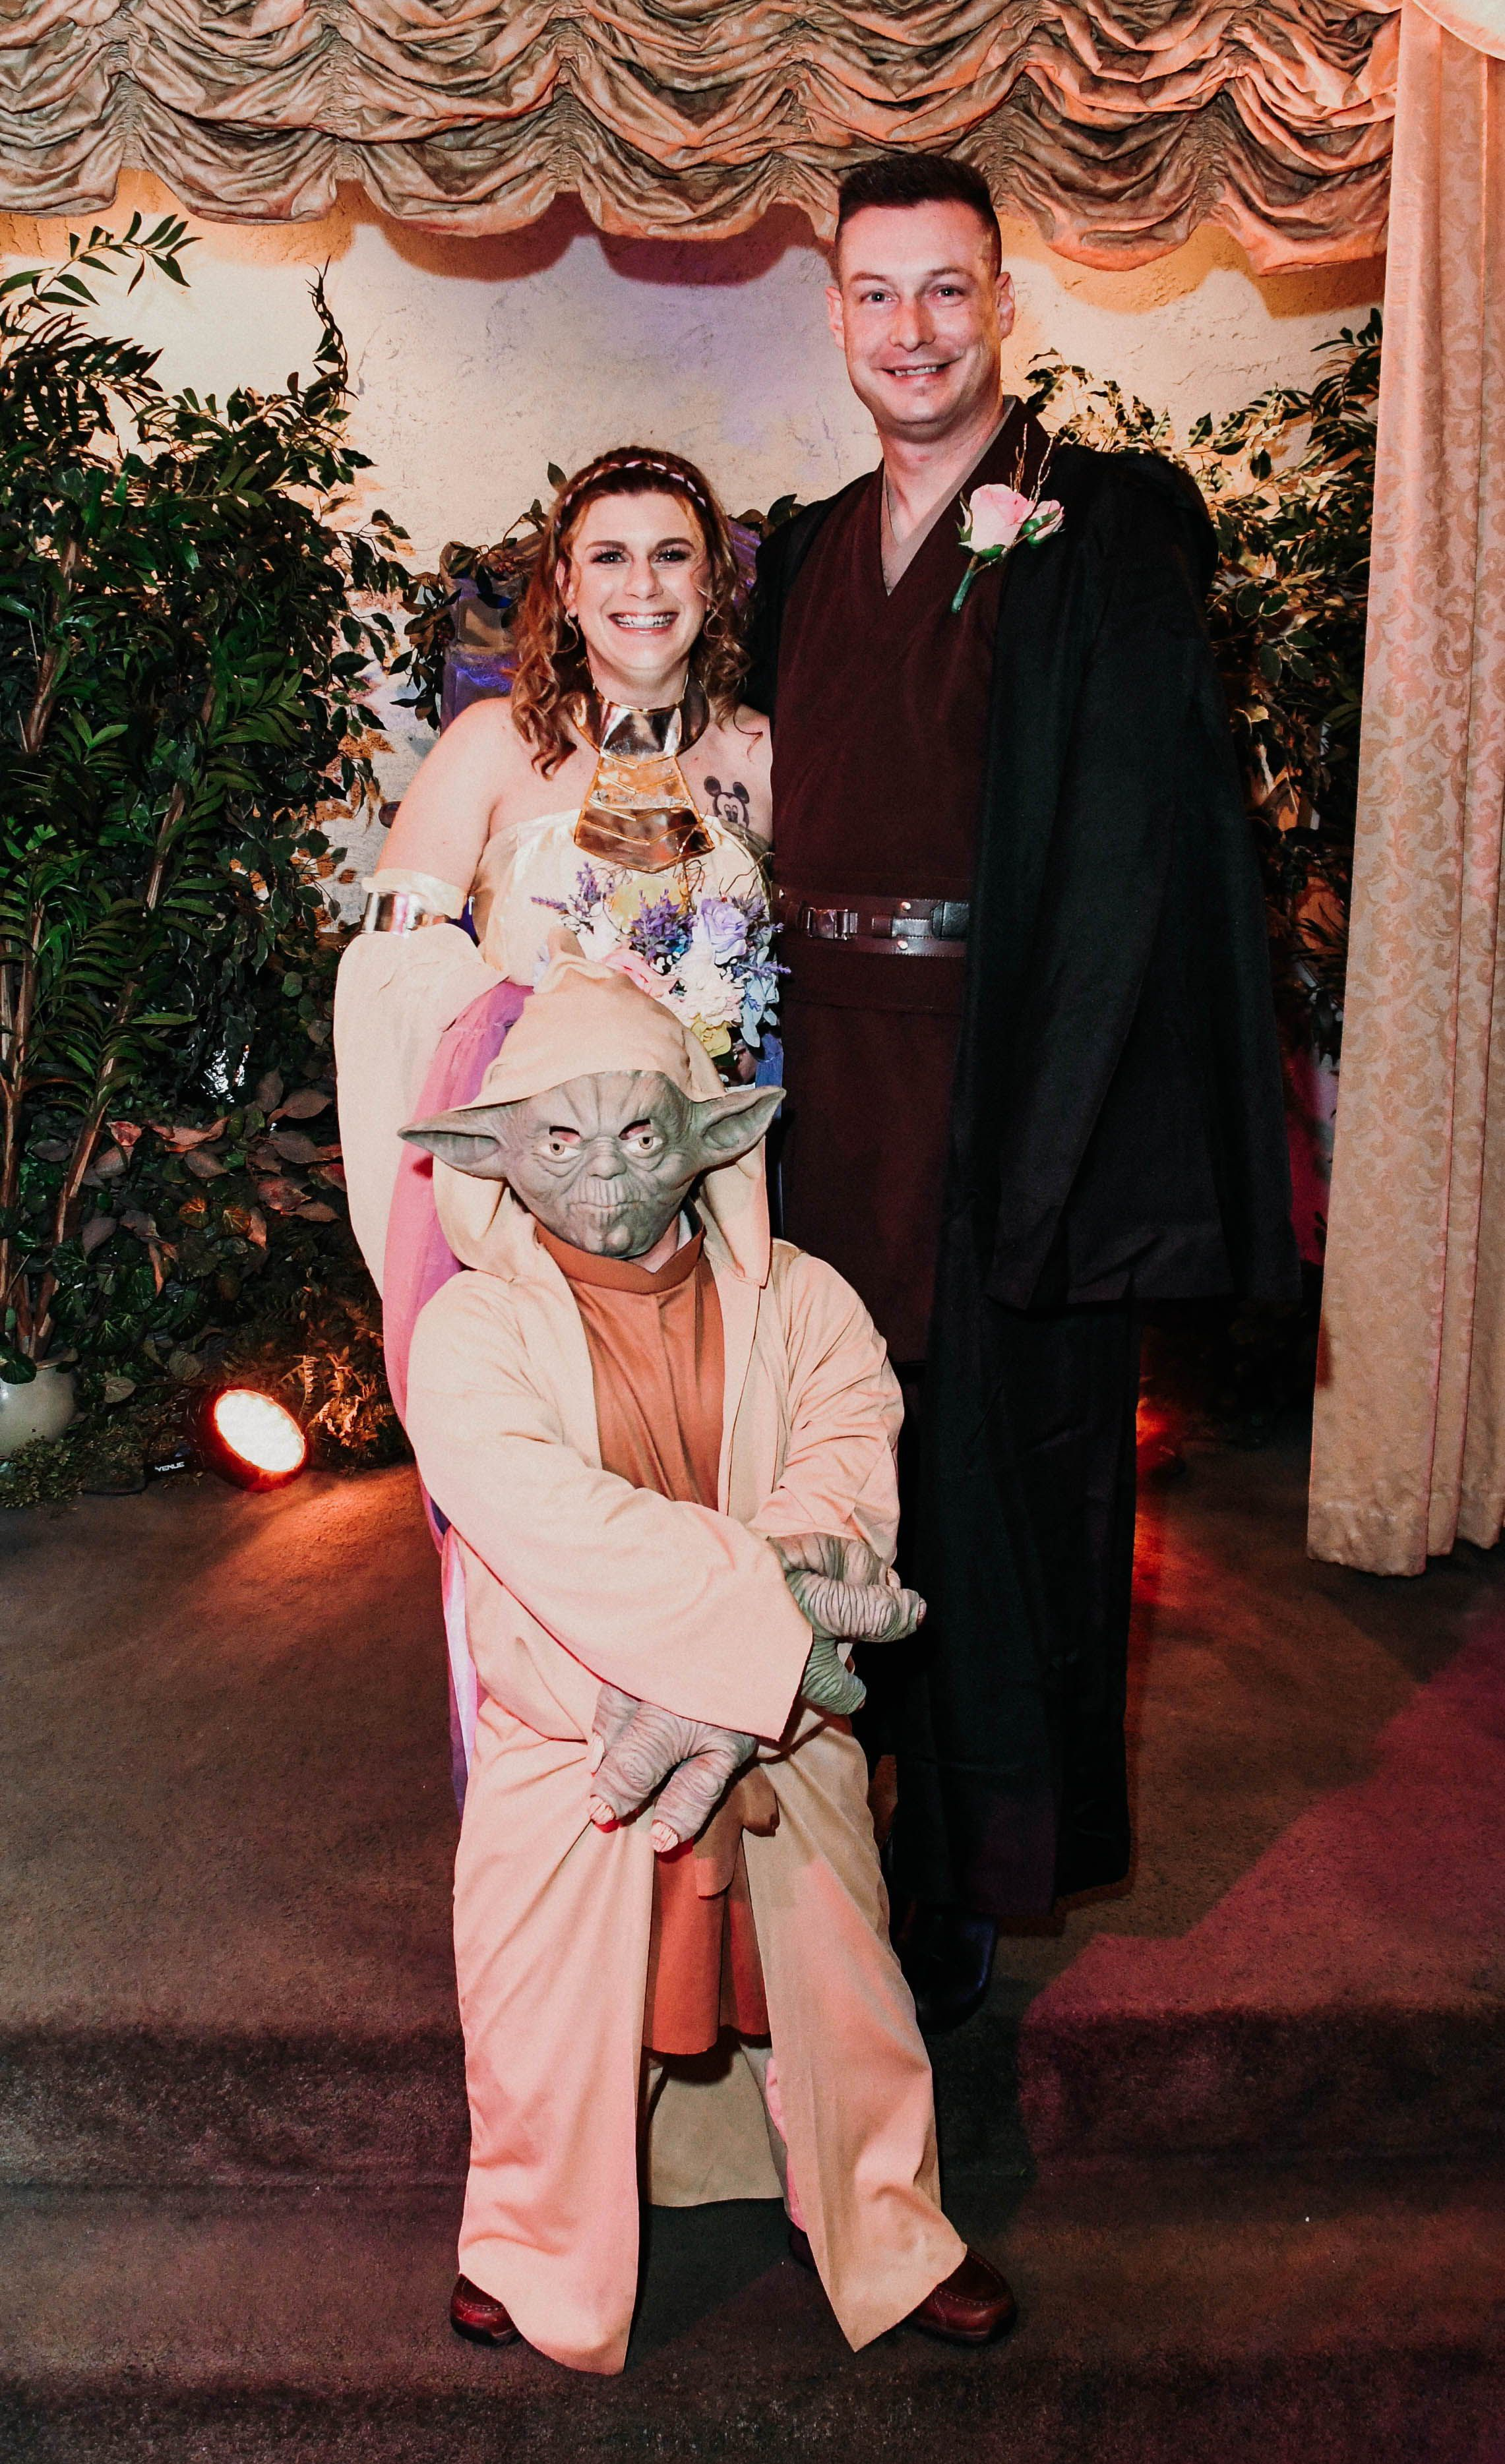 Yoda Wedding Star Wars in 2020 Elvis wedding, Vegas